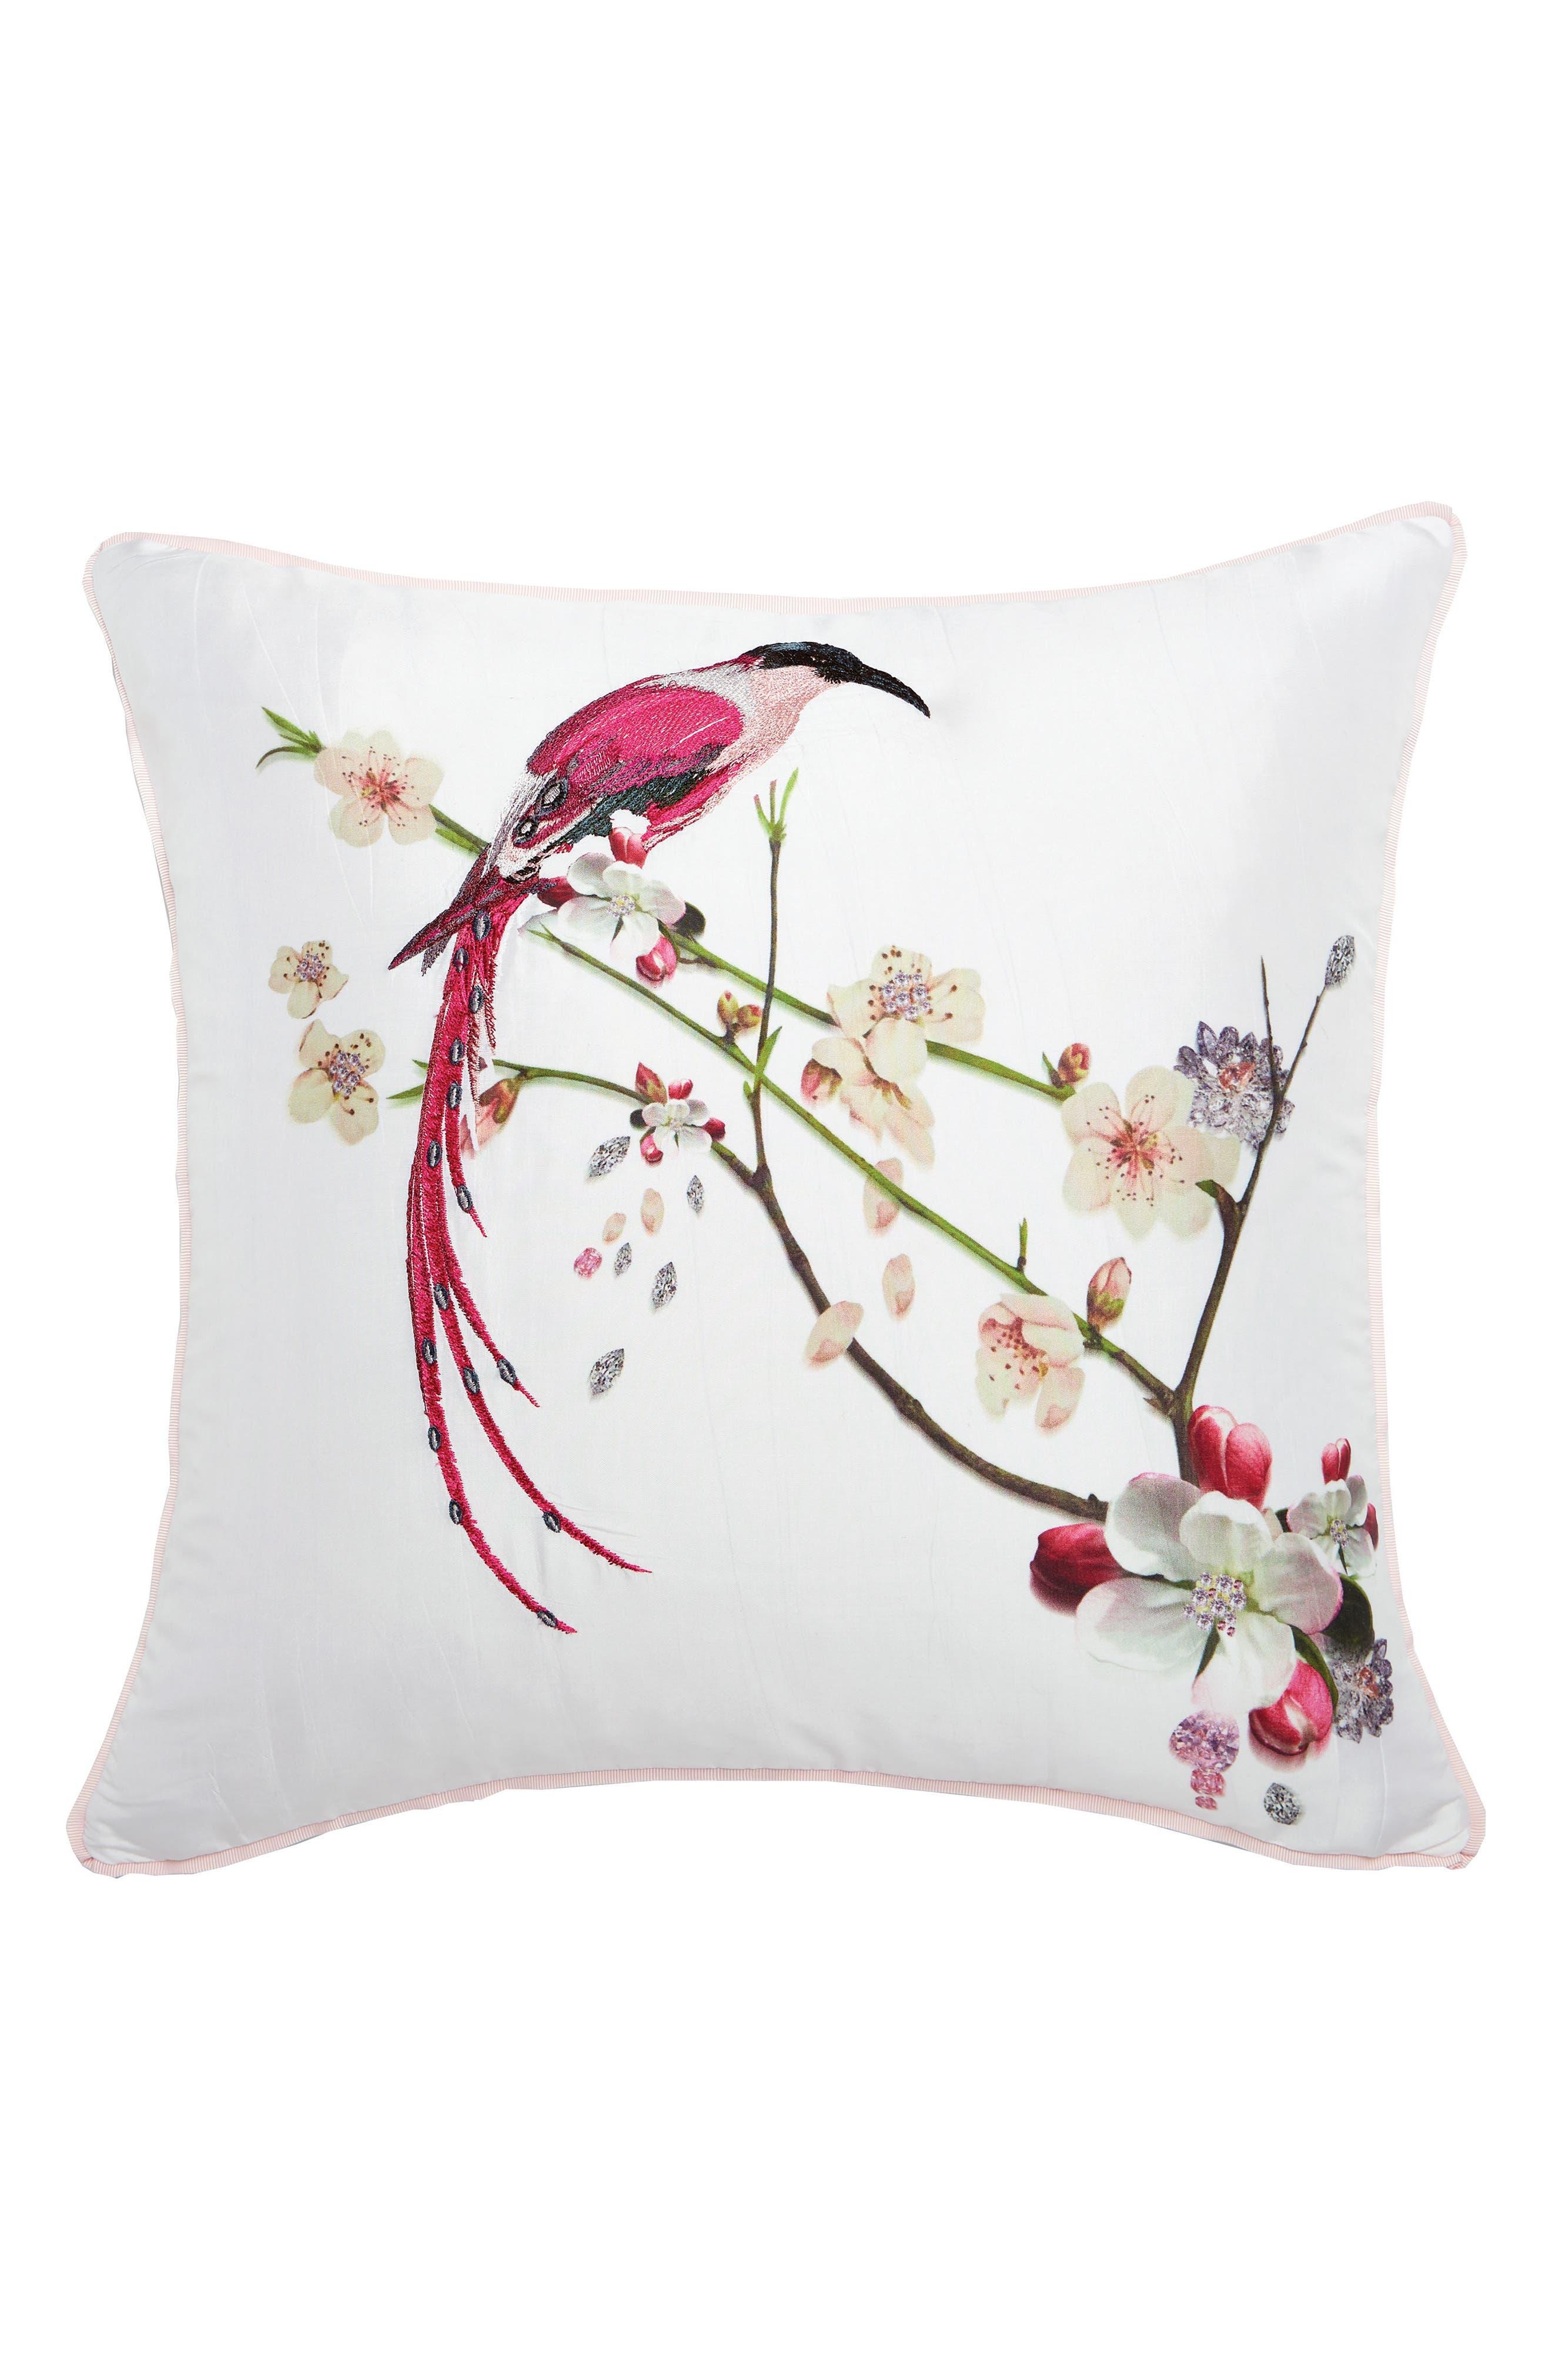 Bird Print Pillow,                         Main,                         color, WHITE/ MULTI